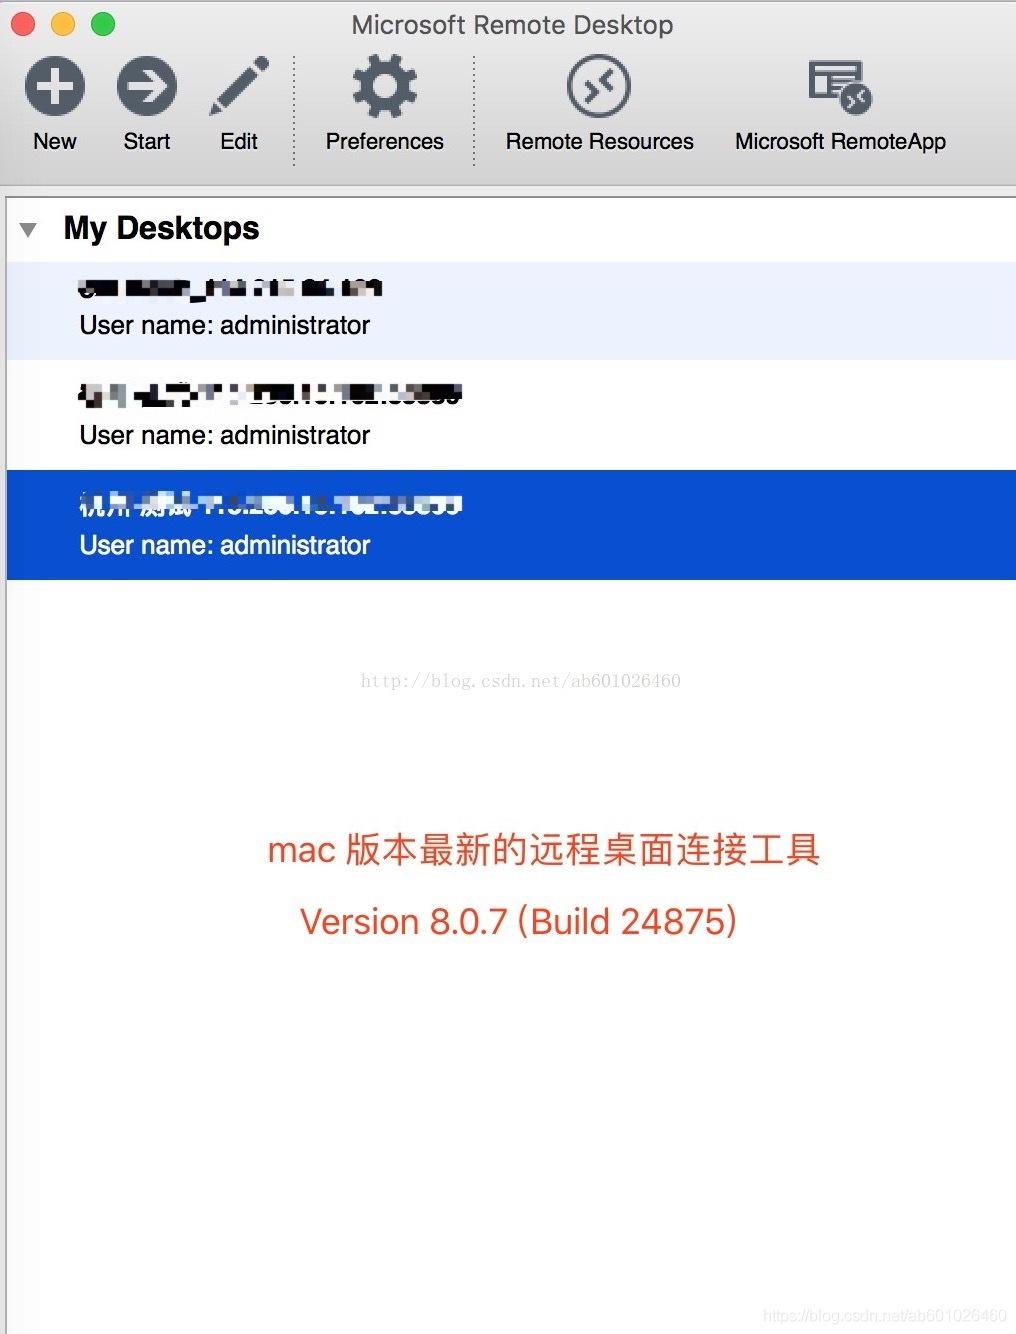 mac远程桌面连接